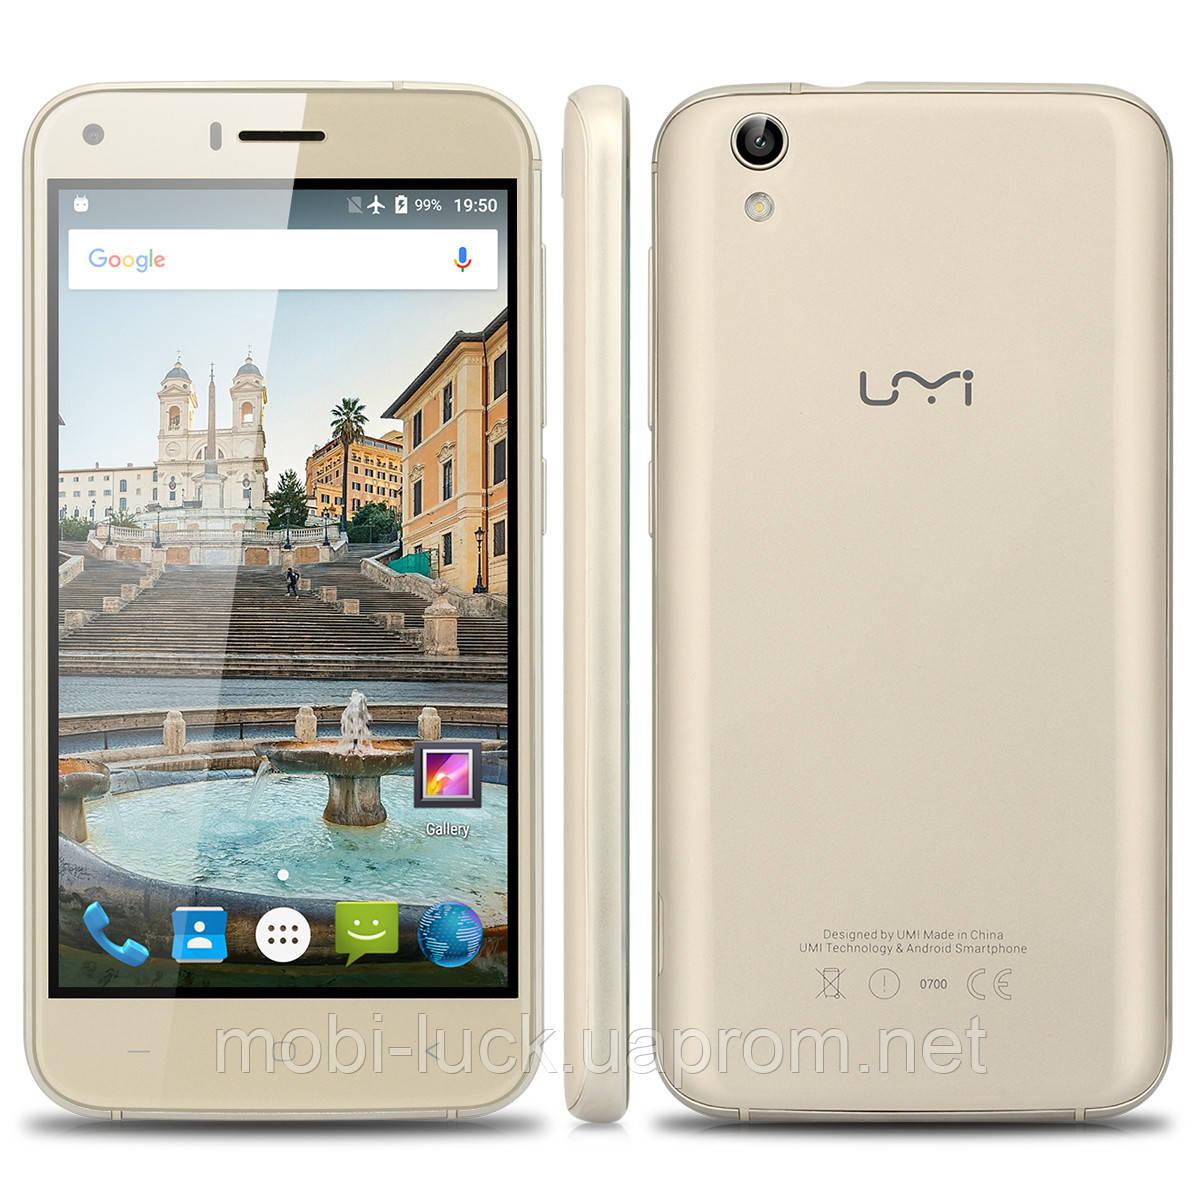 Смартфон UMI London 2 сим,5 дюймов,4 ядра,8 Гб,8 Мп, 3G.